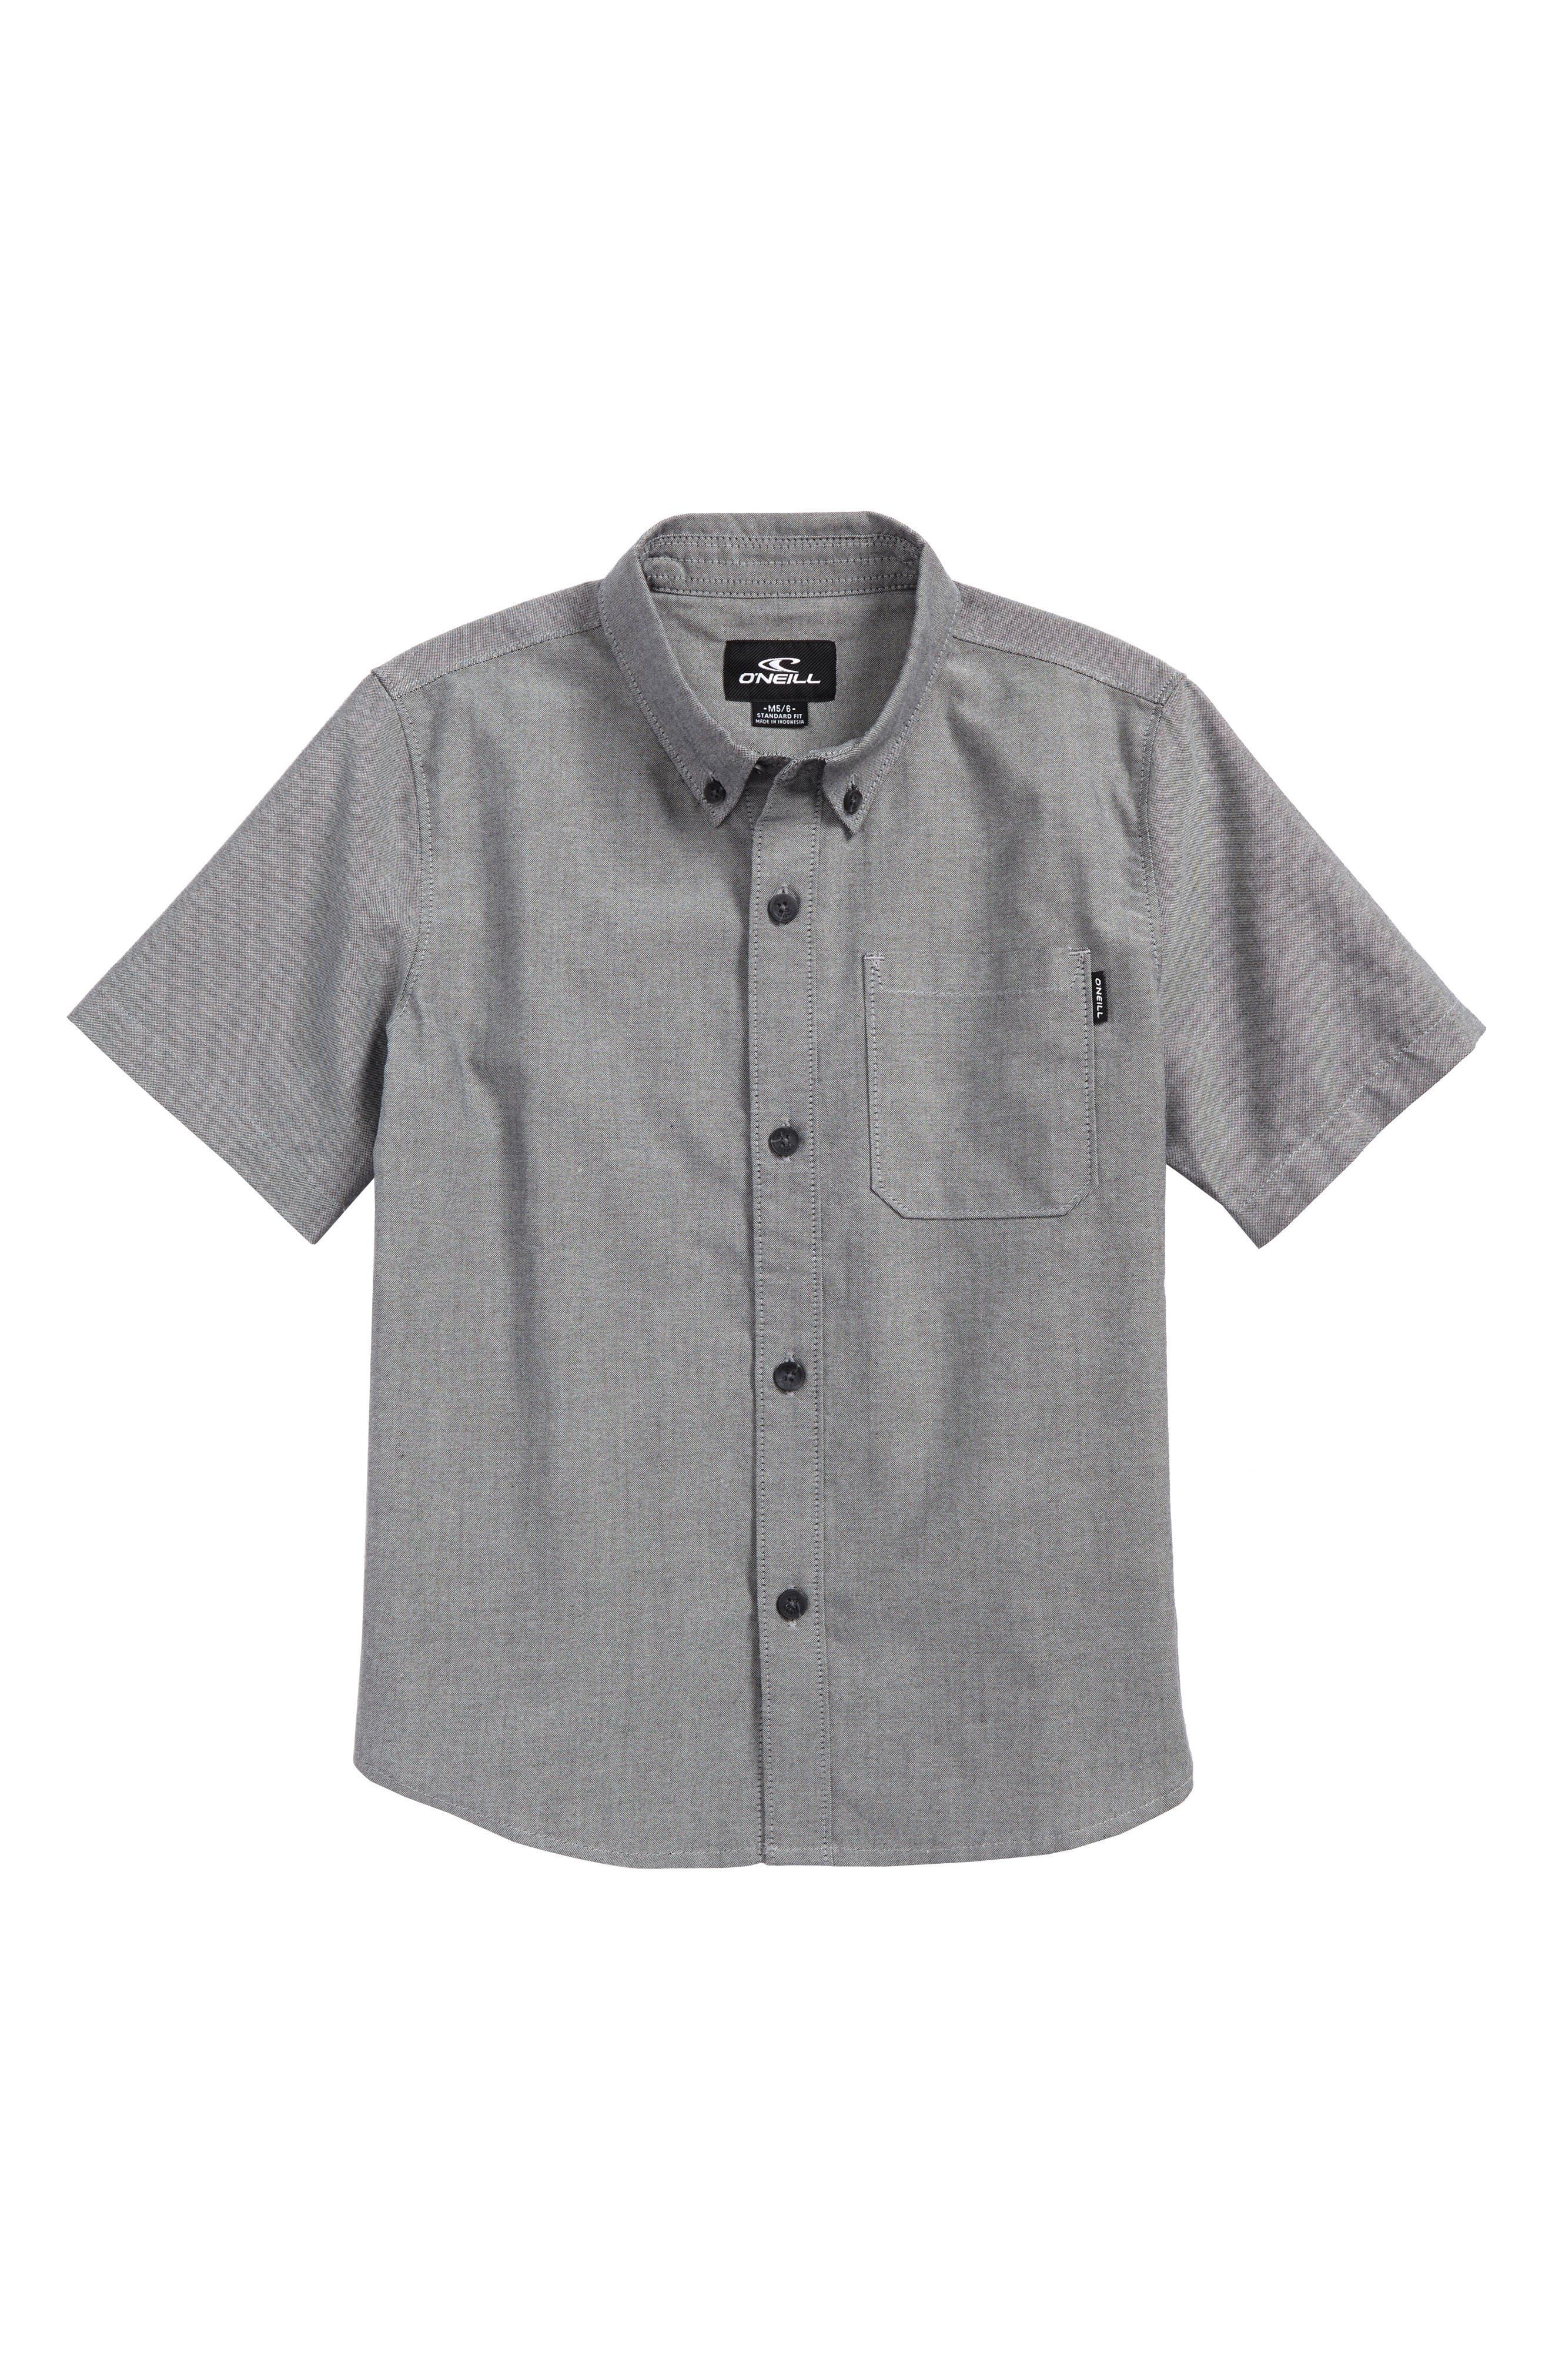 Main Image - O'Neill Banks Woven Shirt (Toddler Boys, Little Boys & Big Boys)